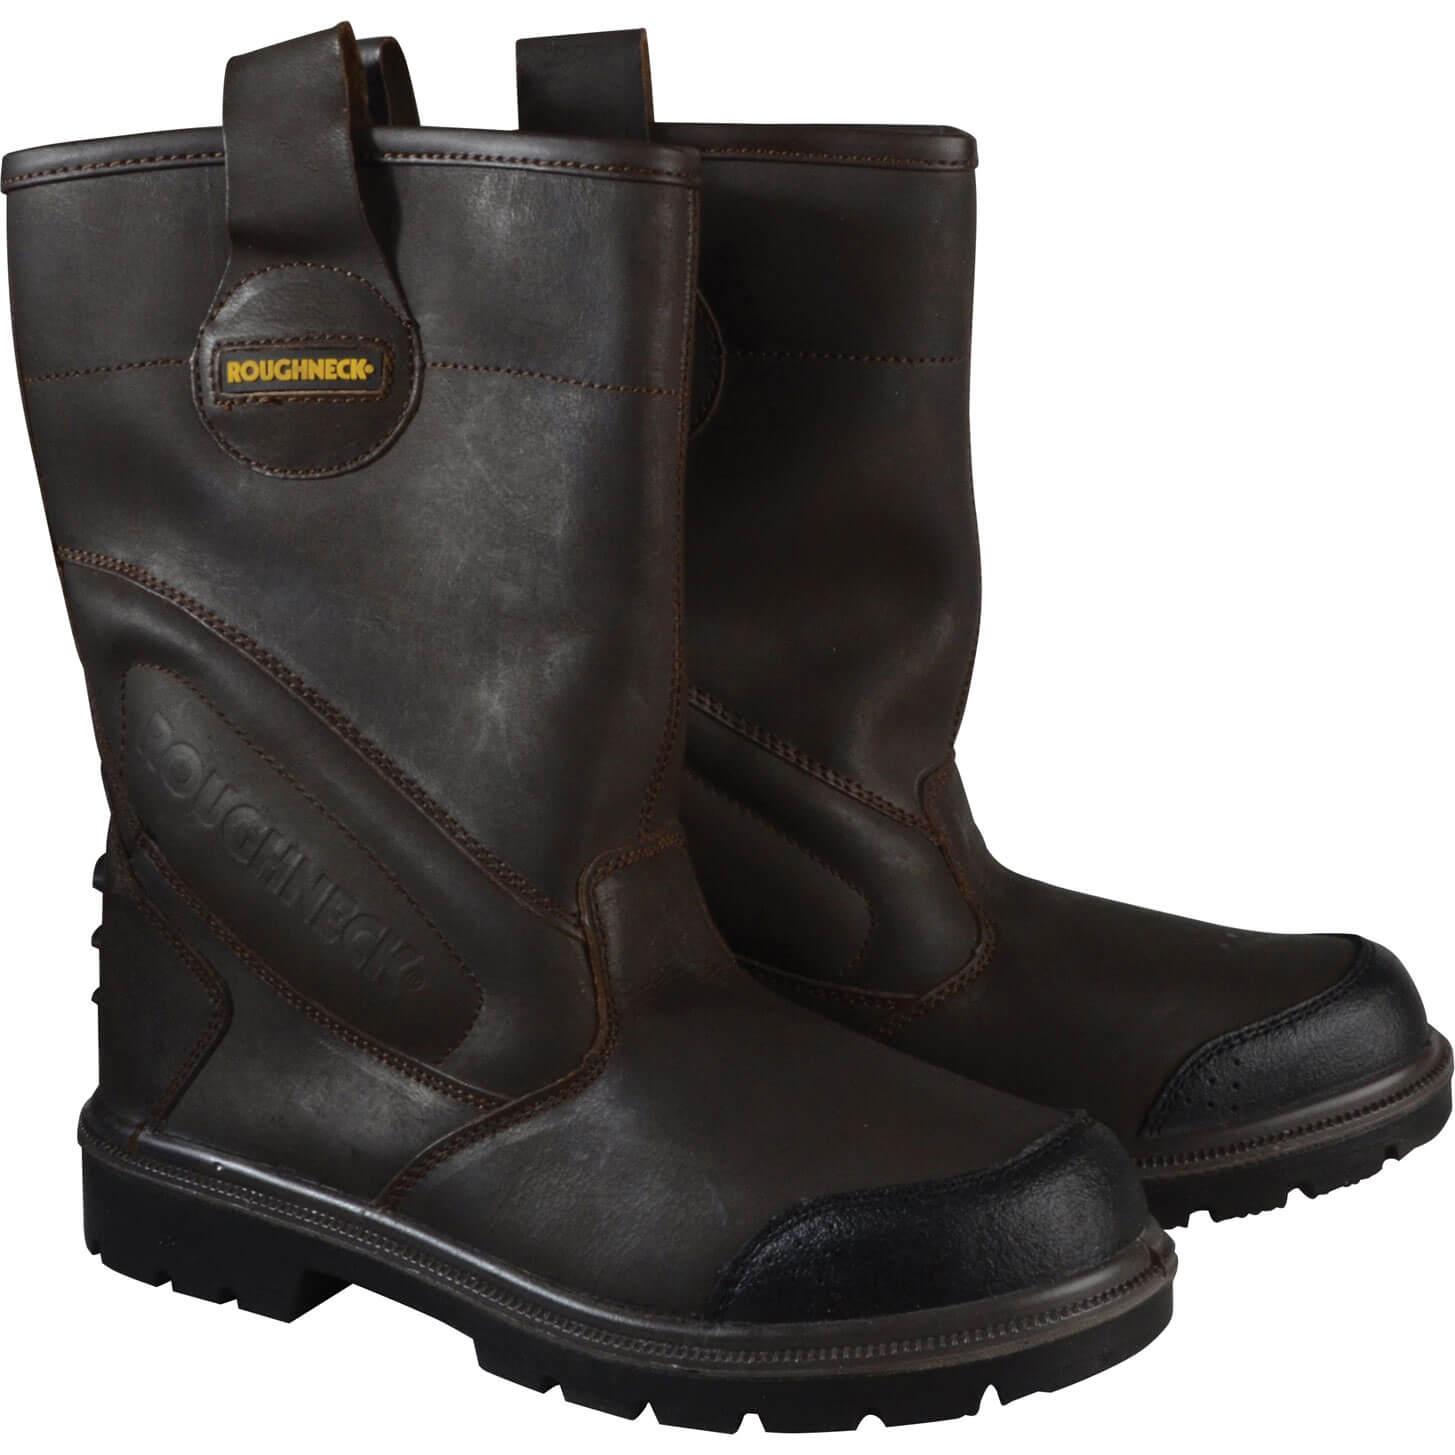 Roughneck Mens Hurricane Rigger Safety Boots Dark Brown Size 6